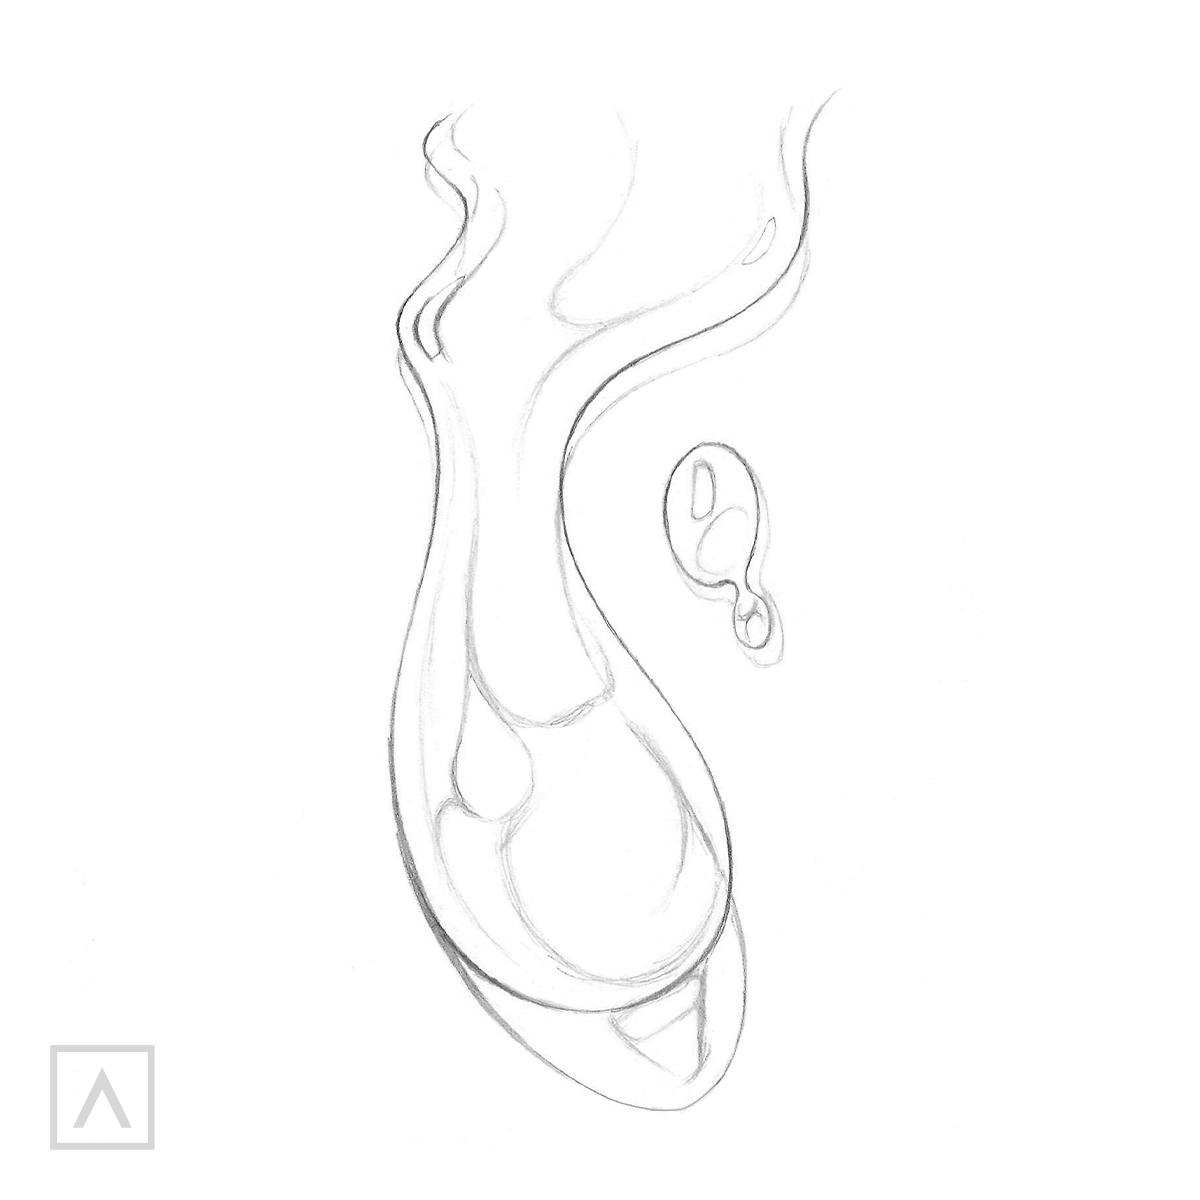 Image of a tear step 3